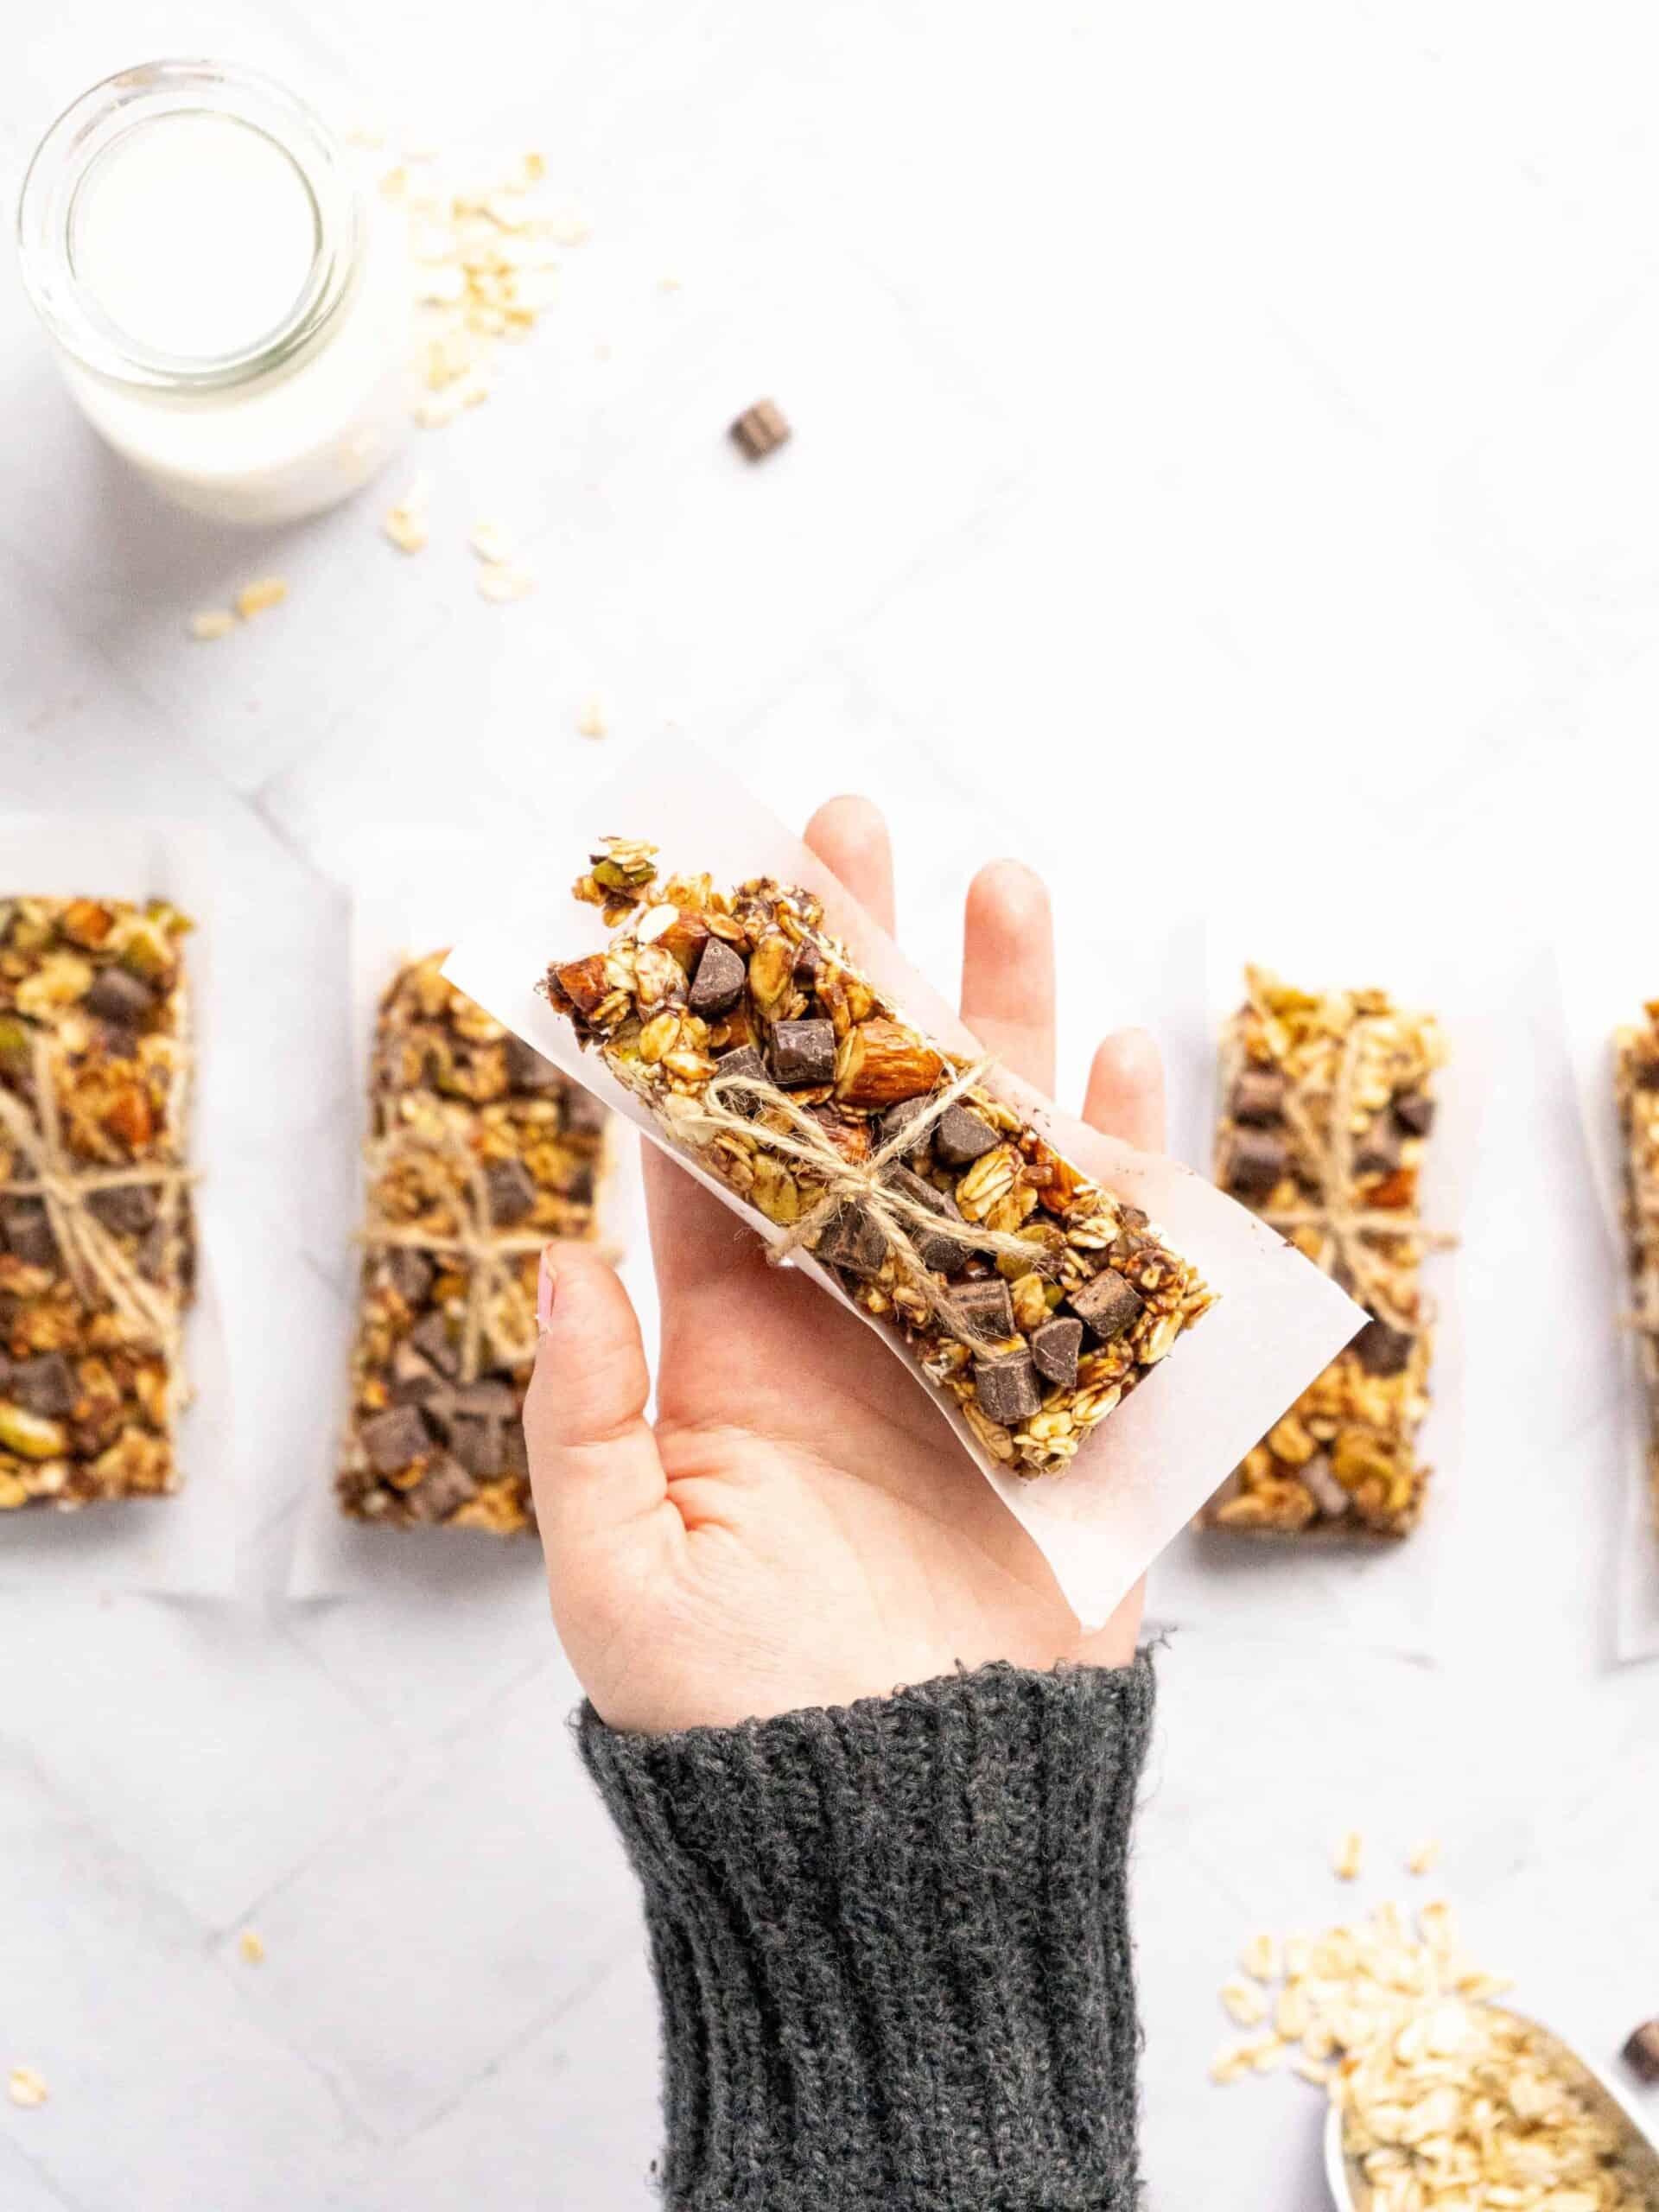 A hand holding a gluten free granola bar